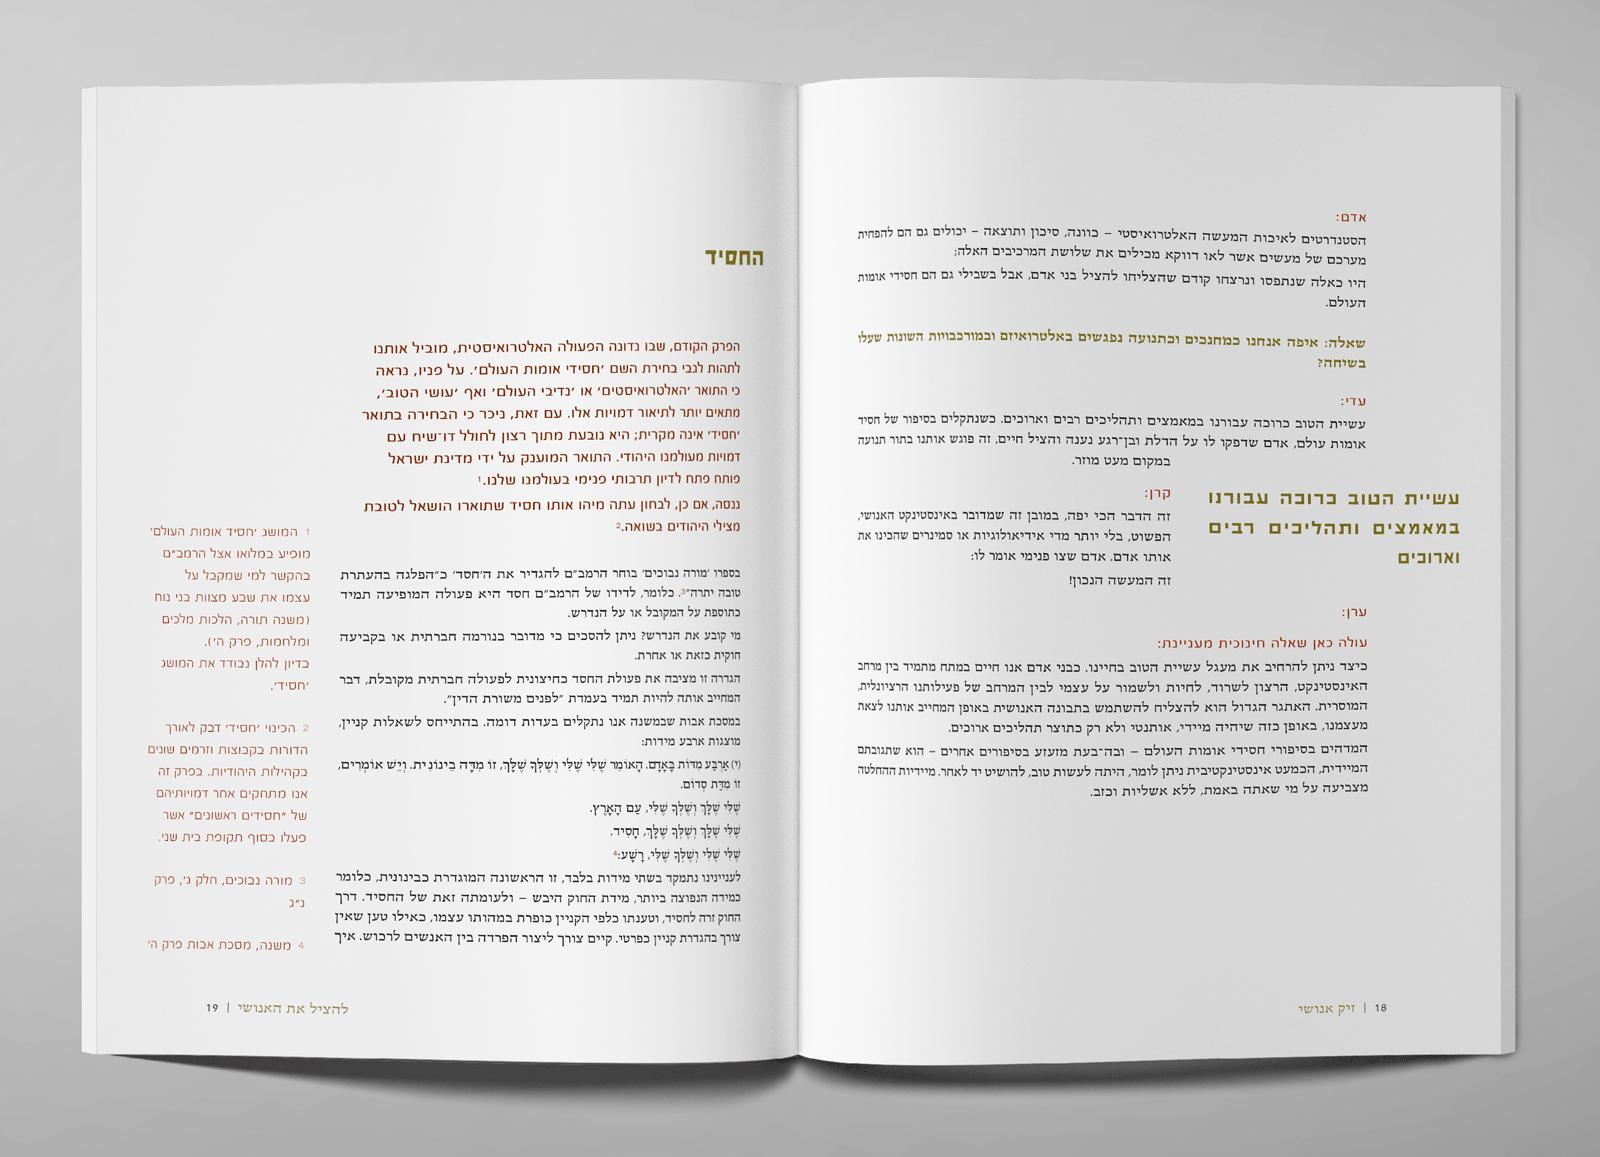 http://bigeyes.co.il/wp-content/uploads/2019/08/hasidim-9.png